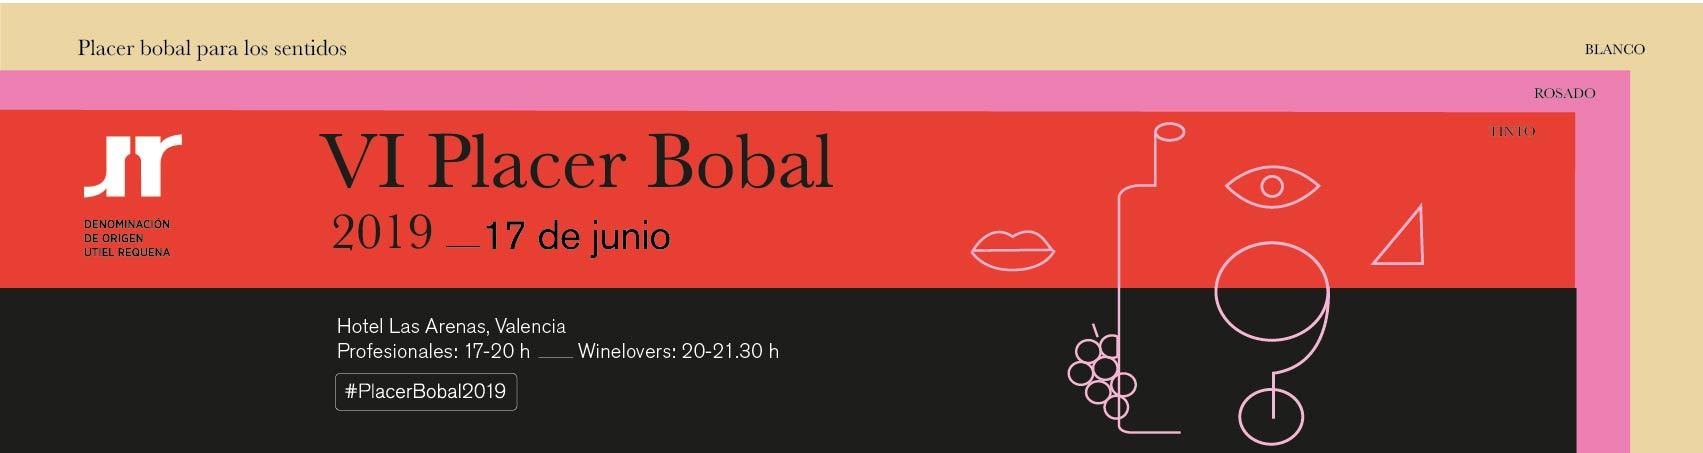 190521-ur-placer-bobal-800x200px